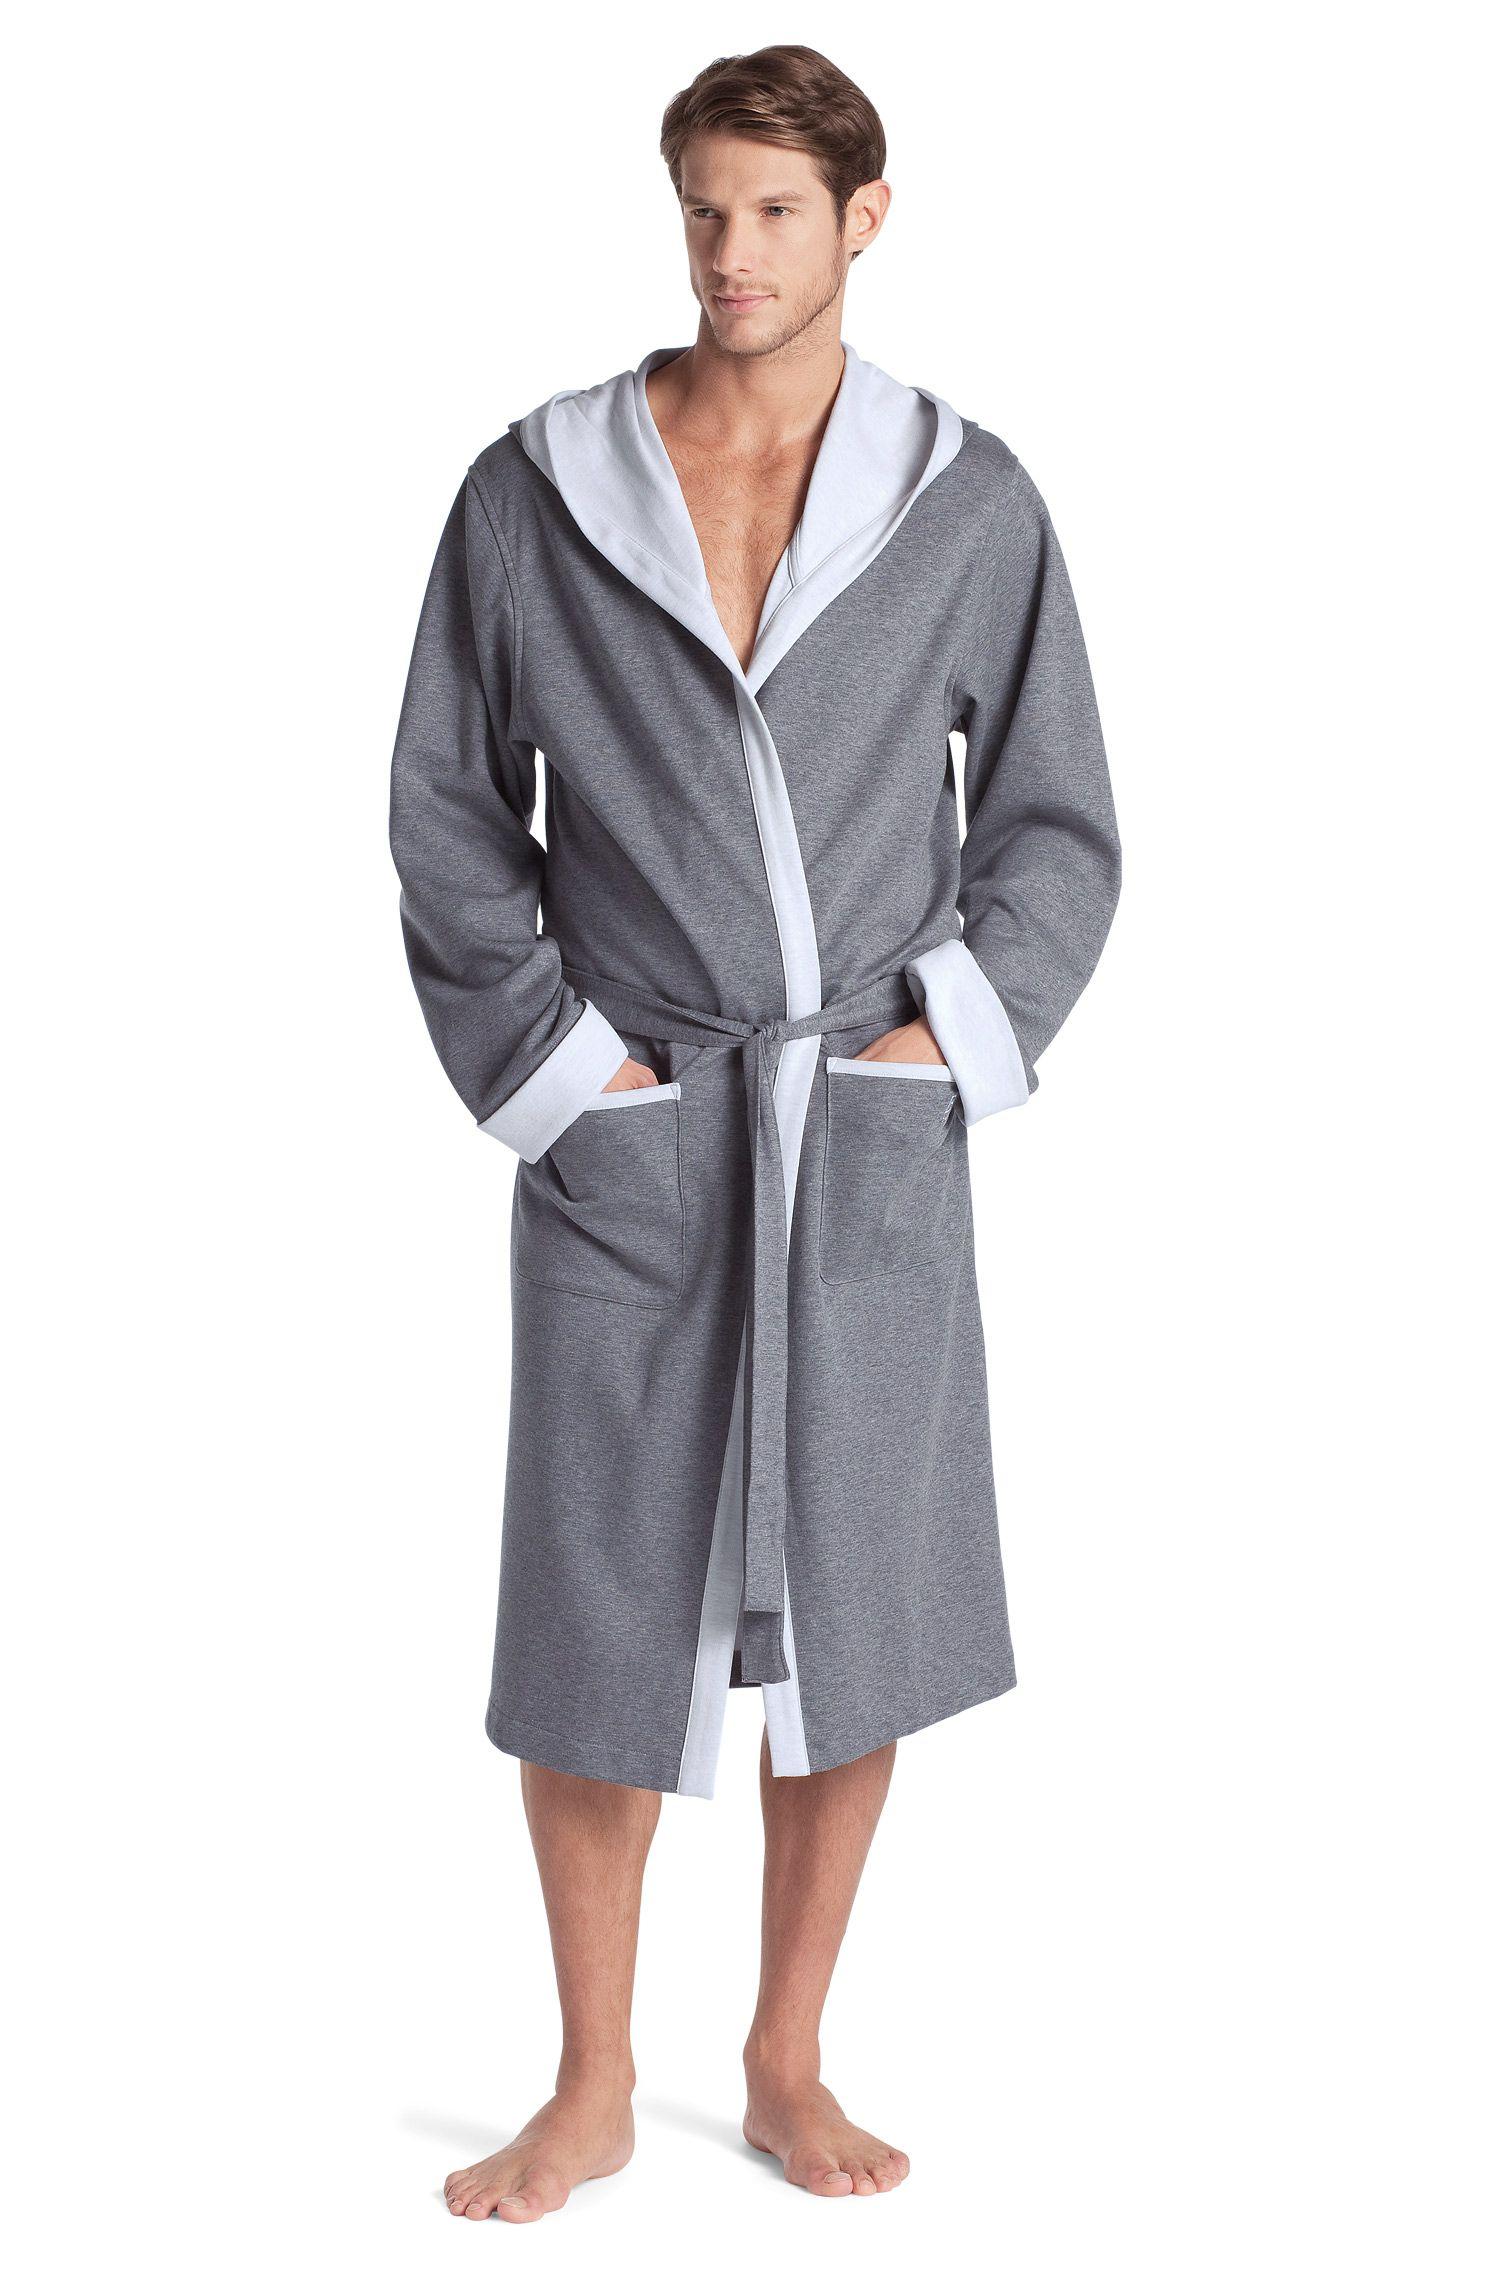 Robe de chambre à capuche, Hooded Robe BM